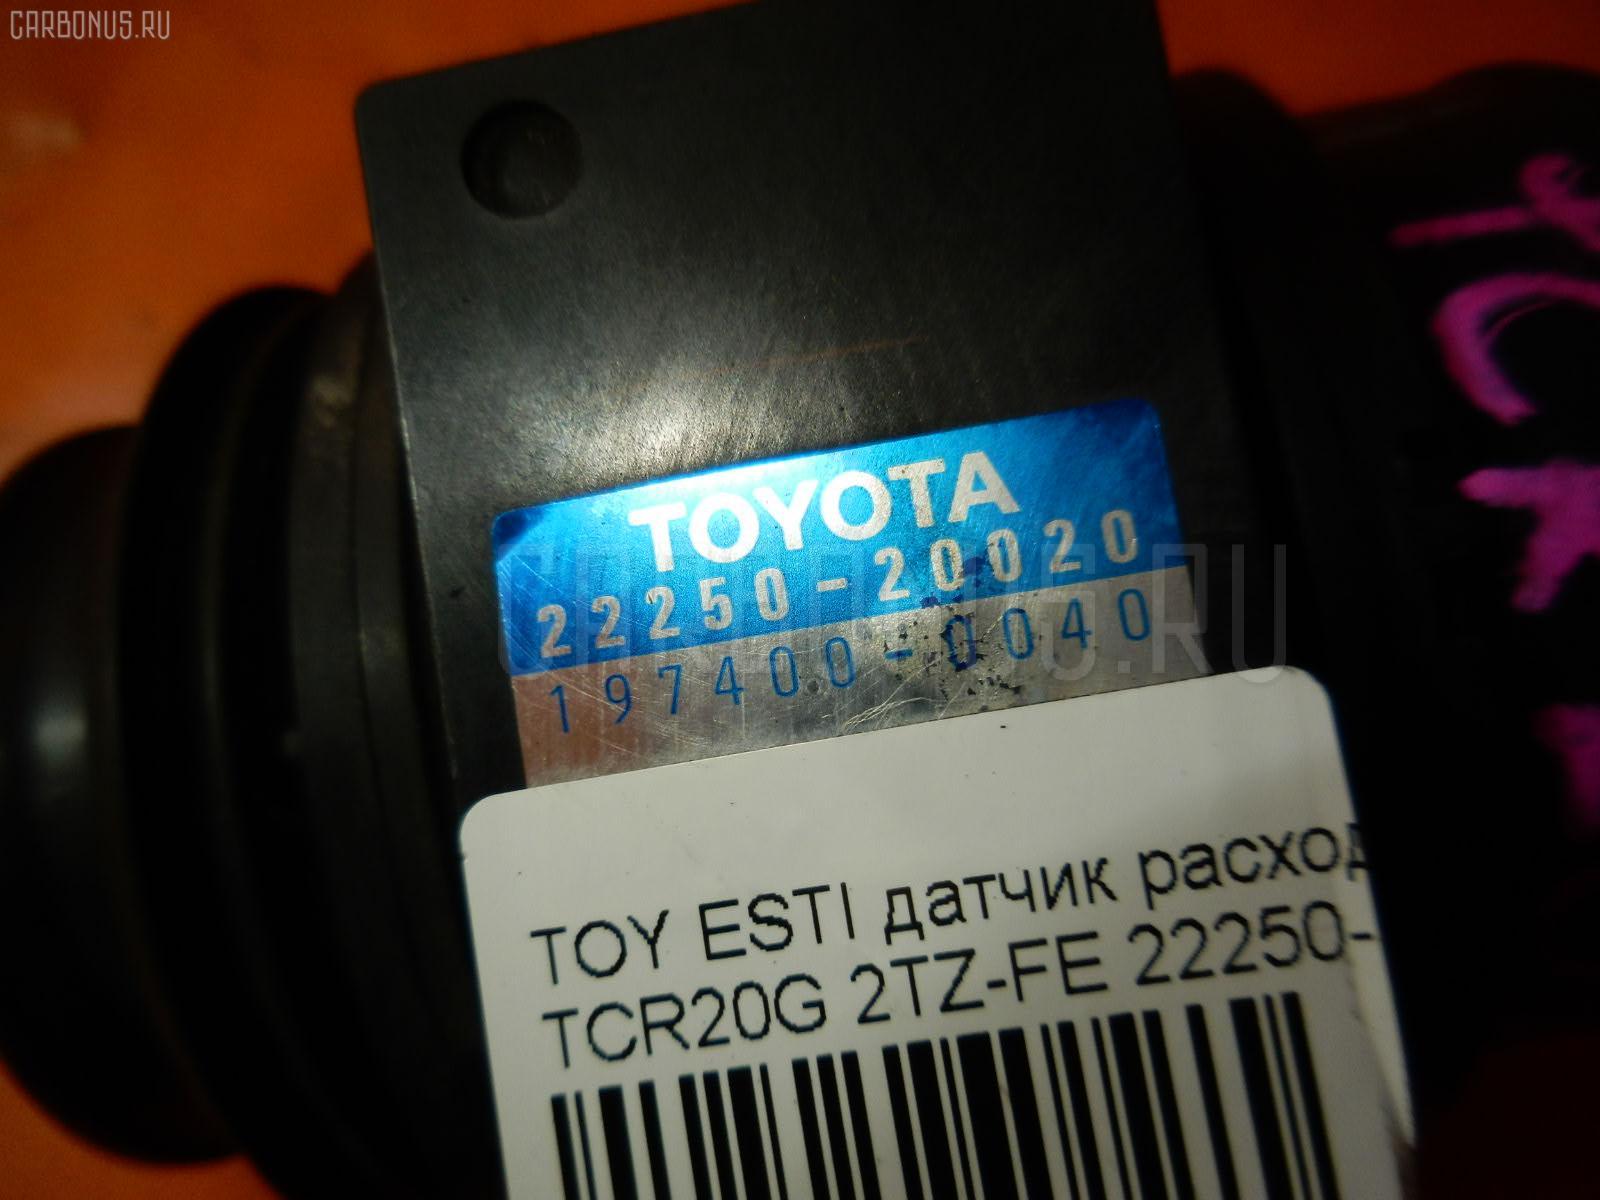 Датчик расхода воздуха Toyota Estima TCR20G 2TZ-FE Фото 1